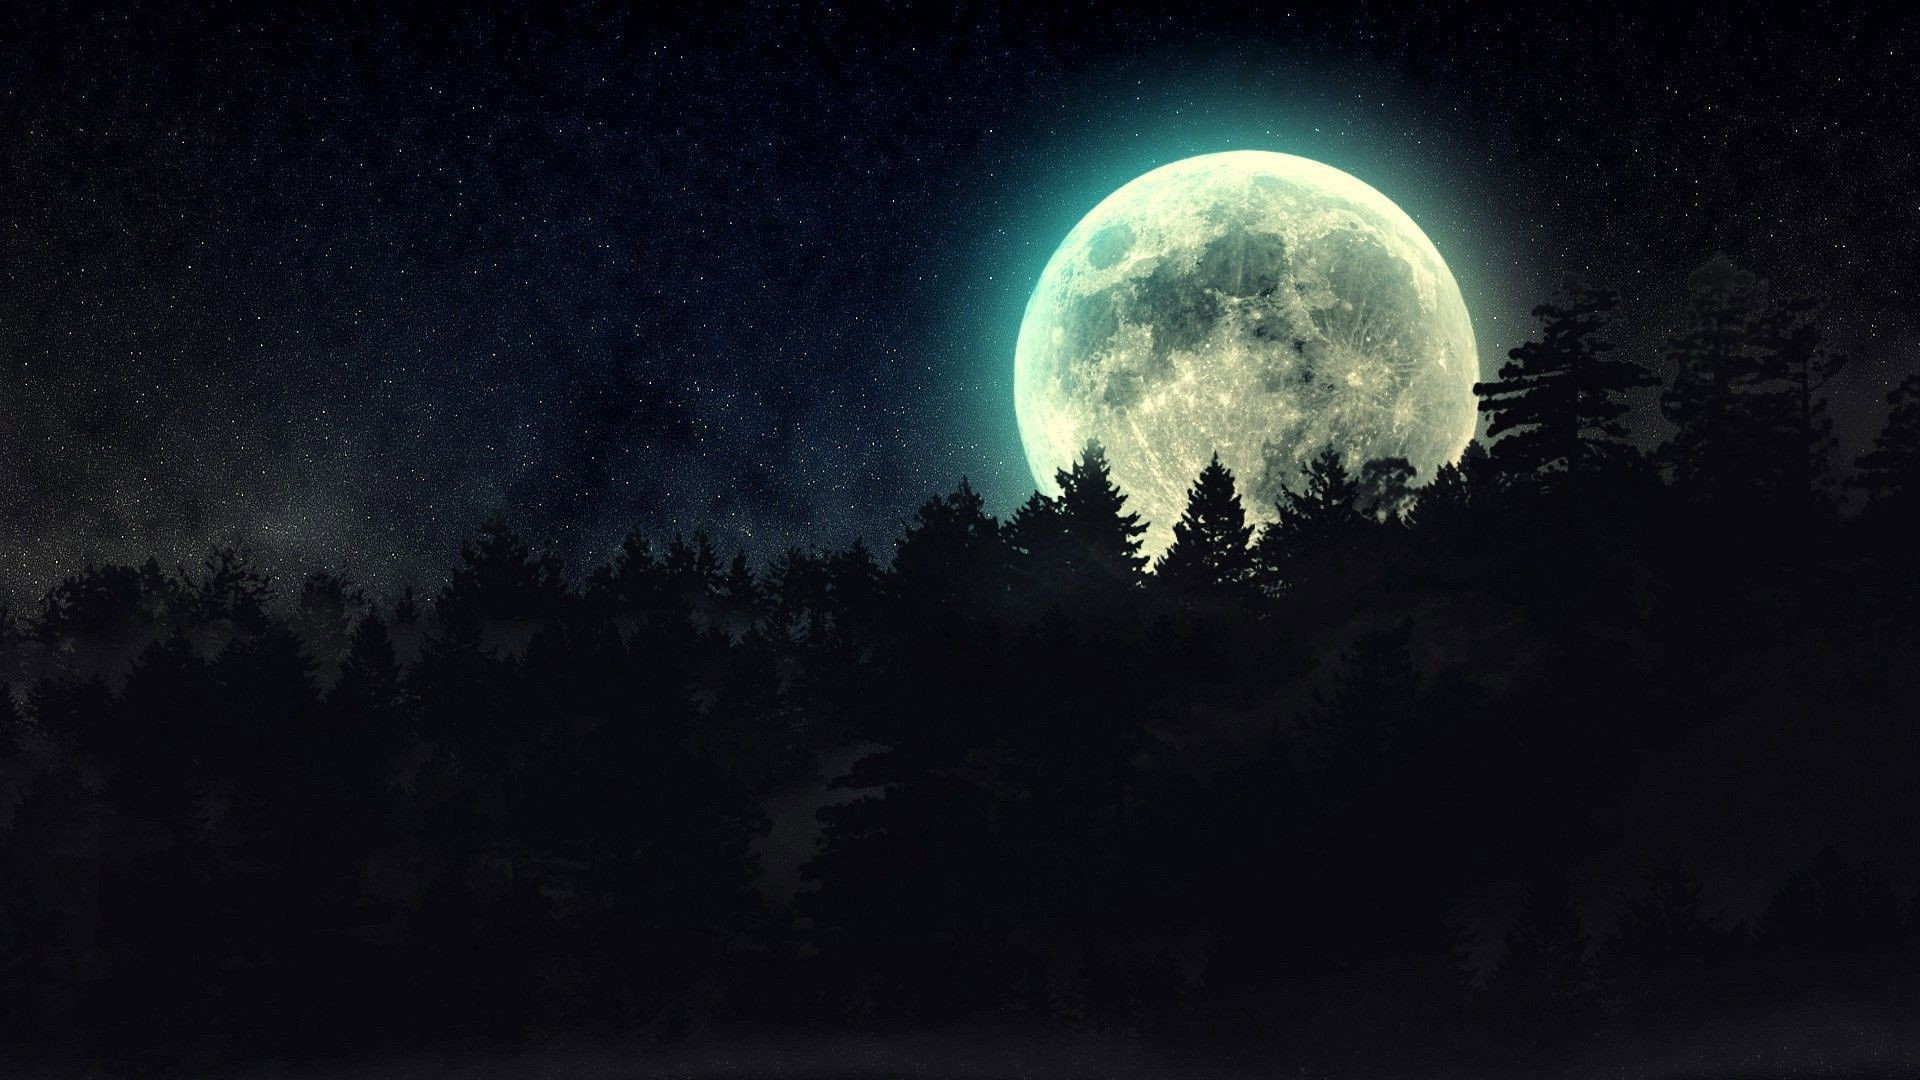 Moon Wallpaper 70 Pictures